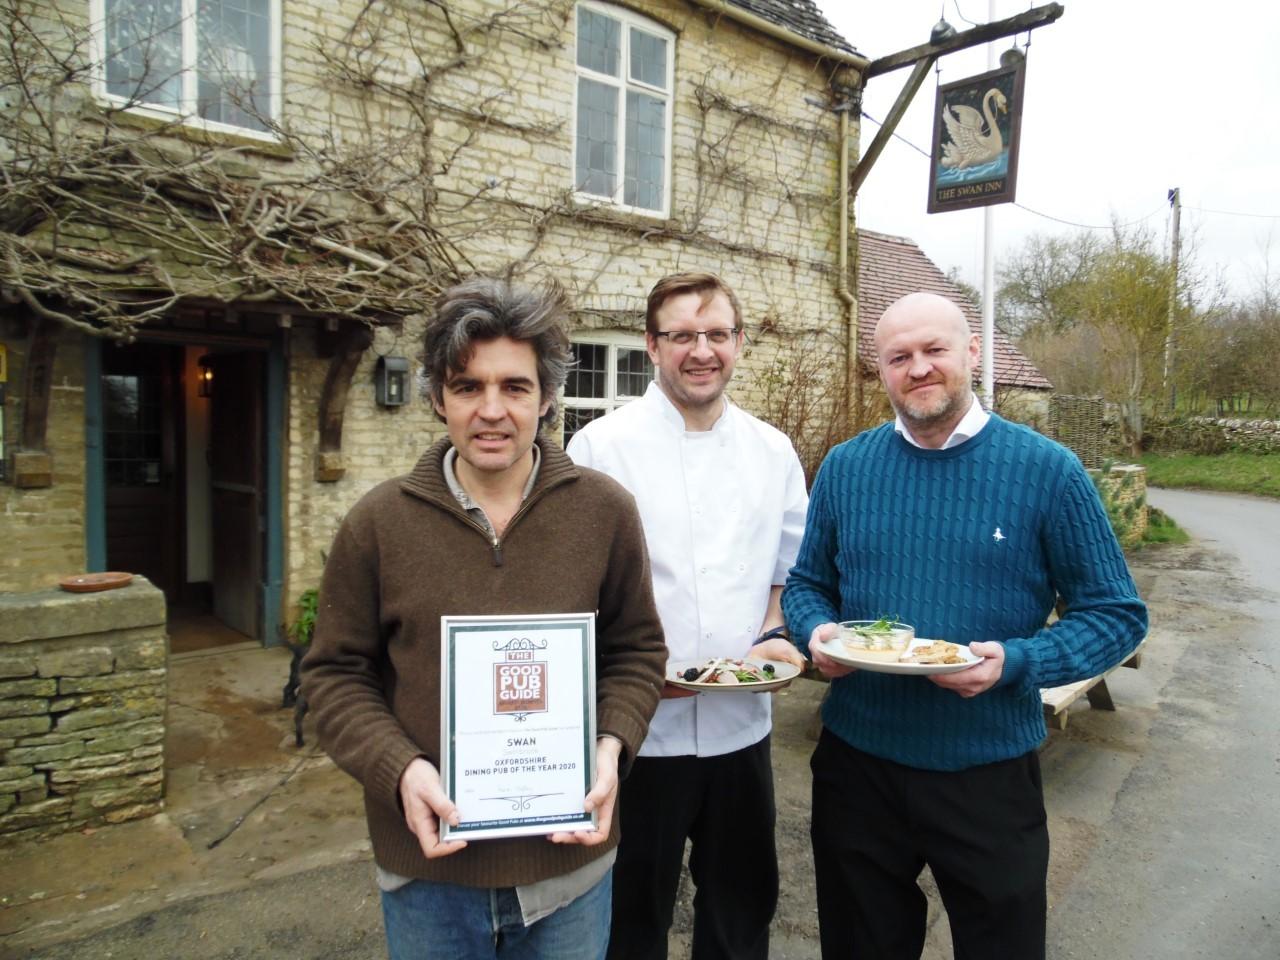 Pub restaurant visited by David Cameron given award